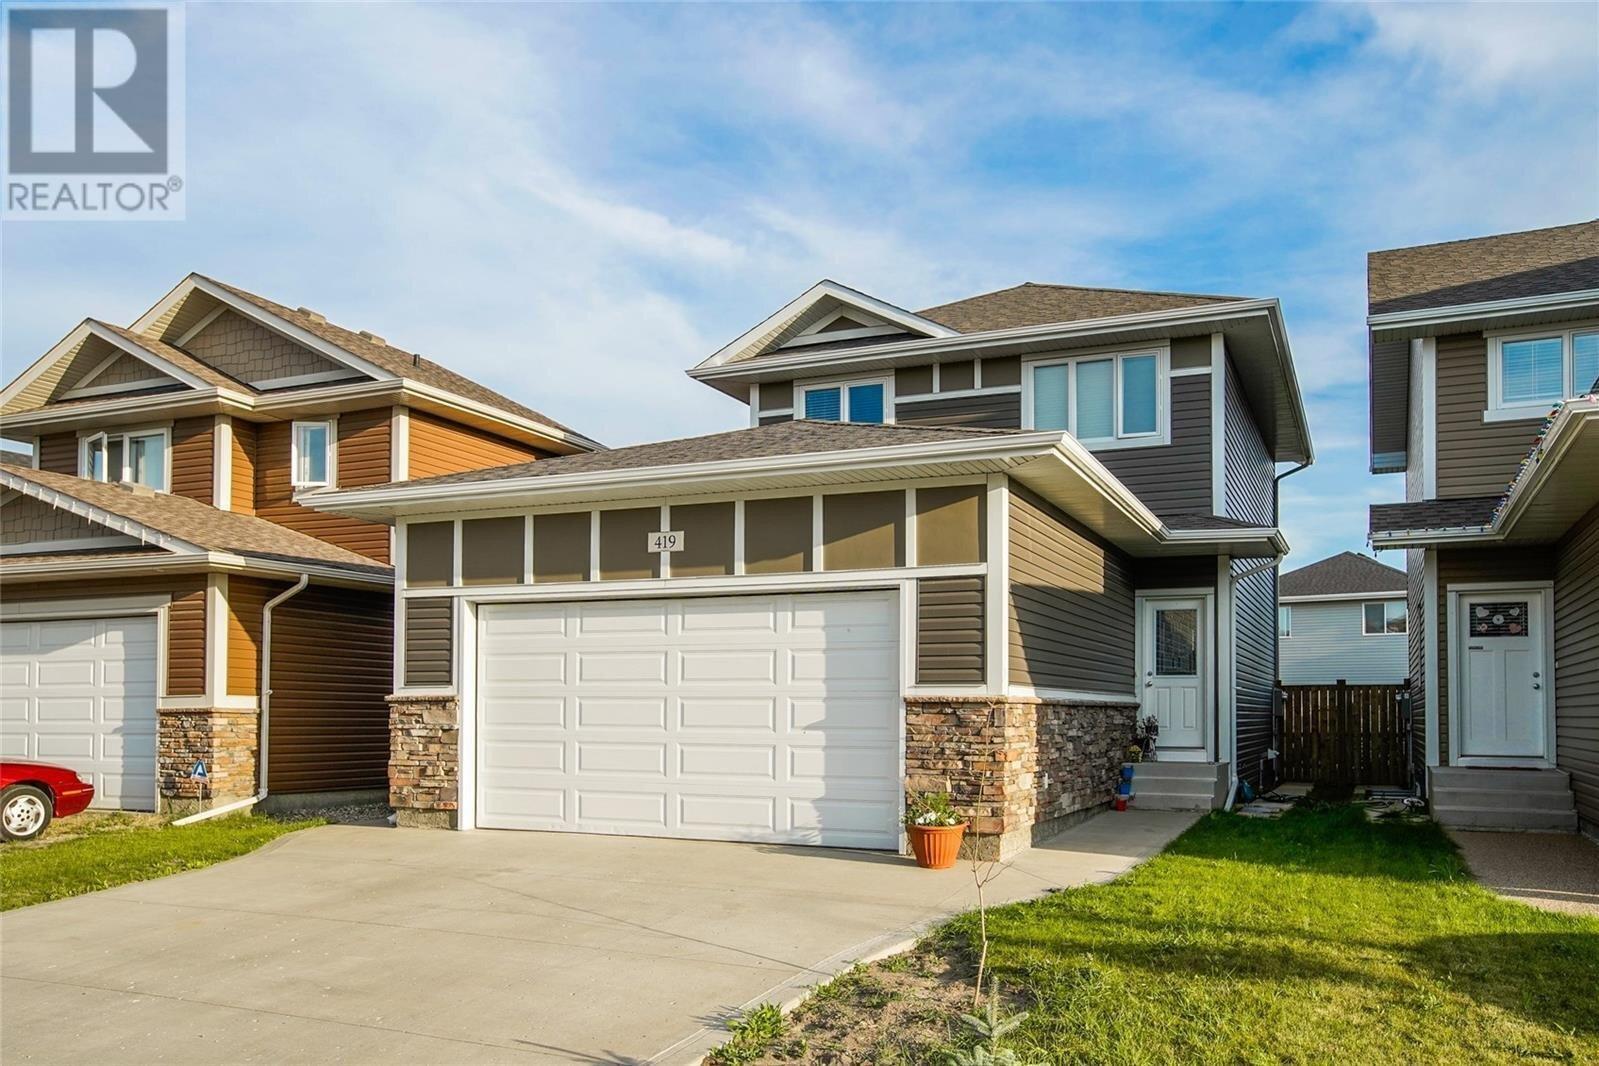 House for sale at 419 Veltkamp Cres Saskatoon Saskatchewan - MLS: SK819246